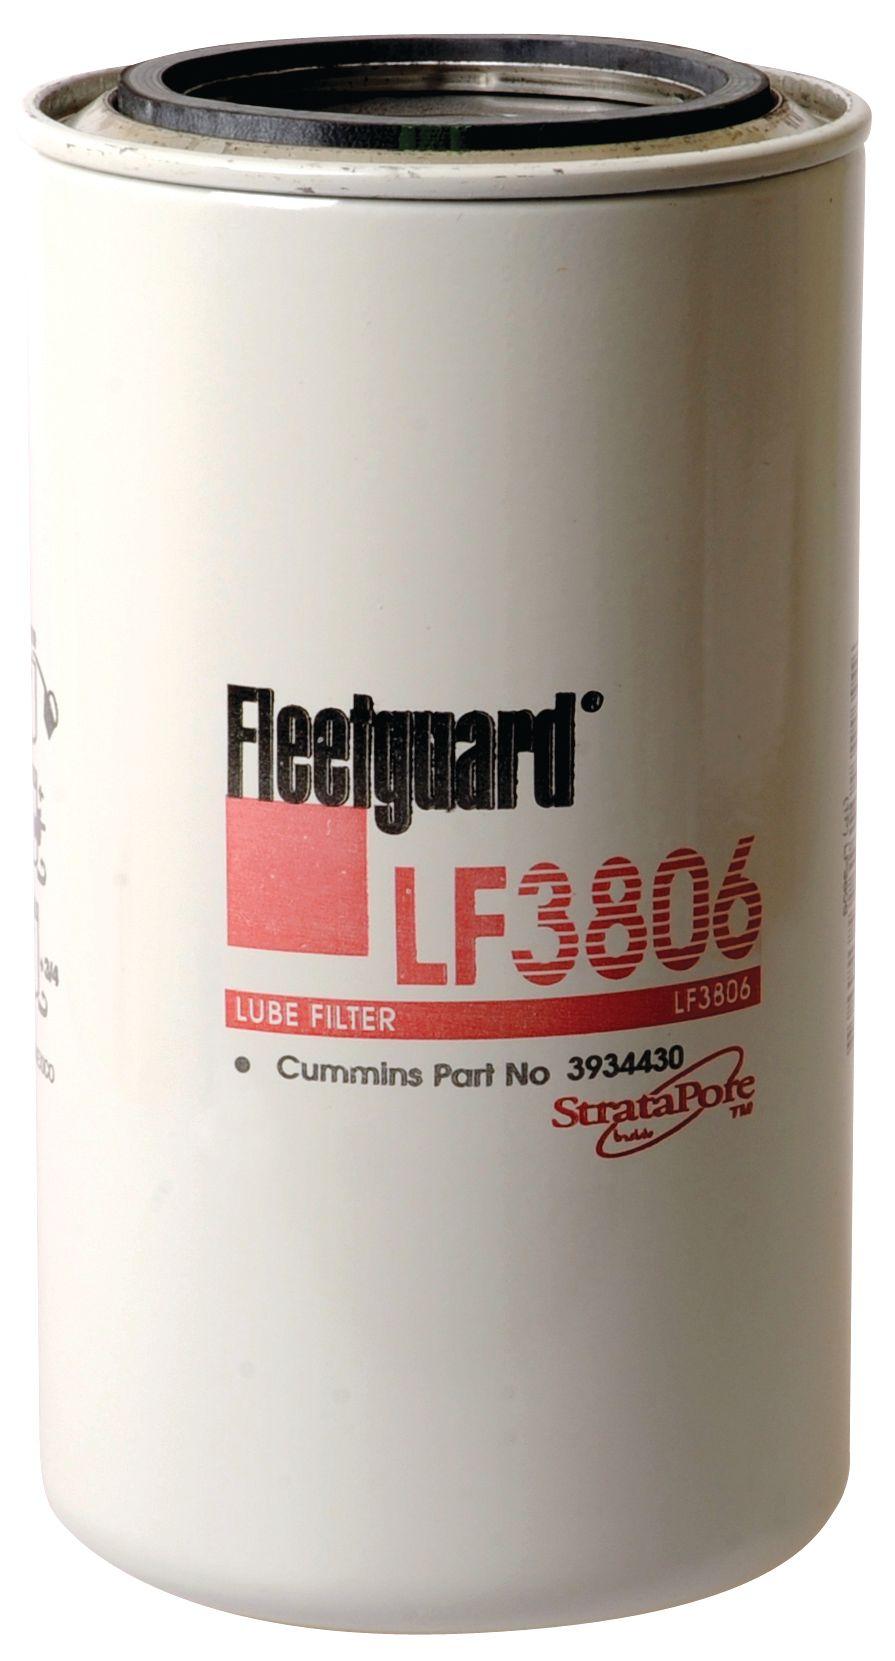 JCB OIL FILTER LF3806 76453